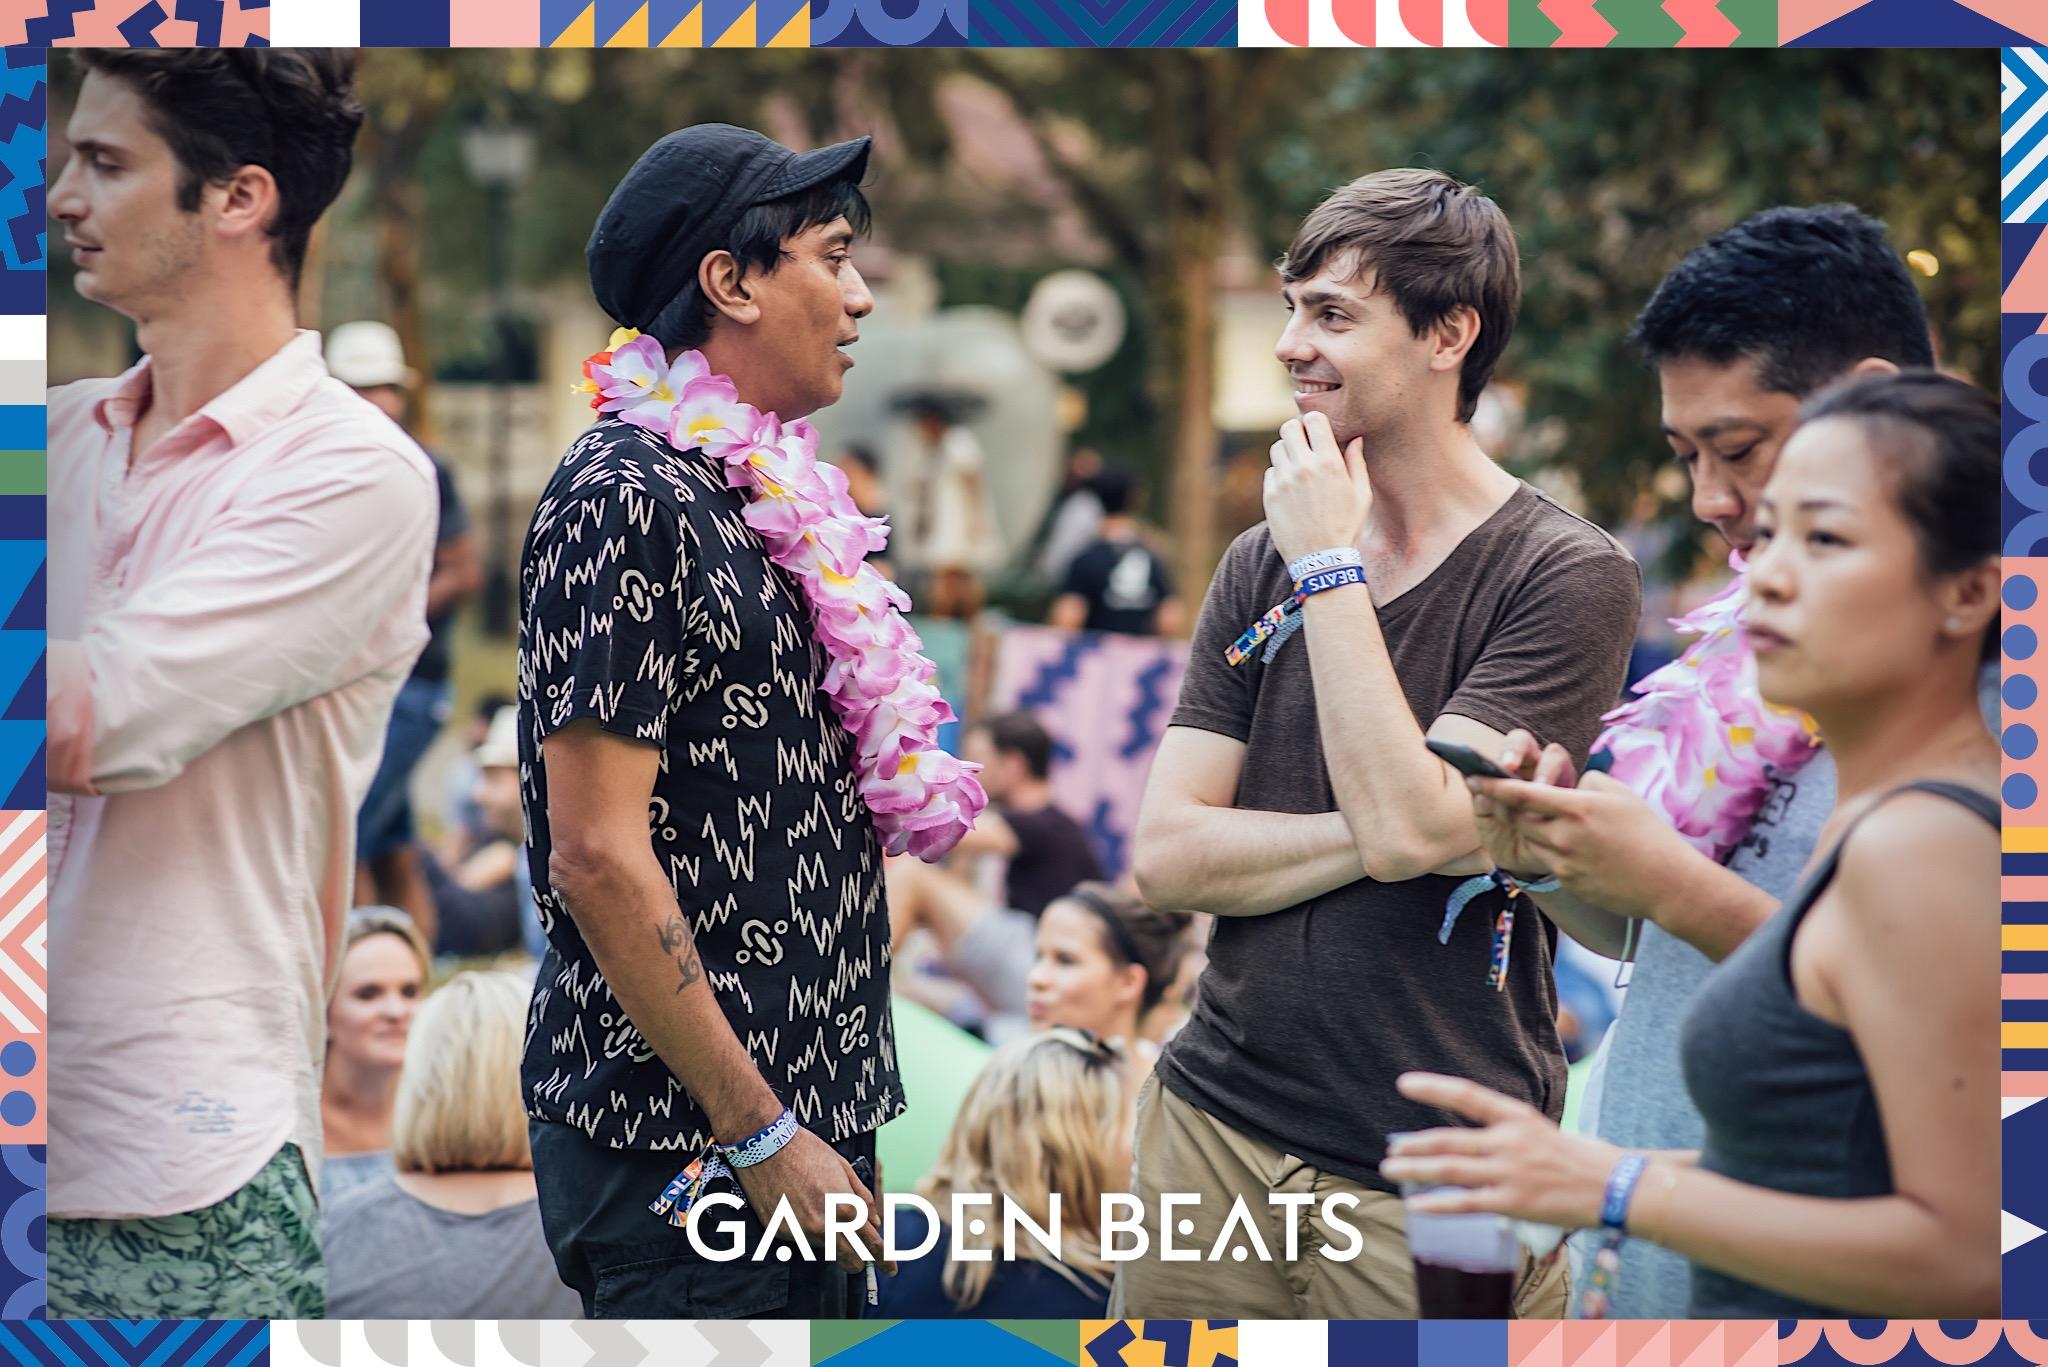 18032017_GardenBeats_Colossal577_WatermarkedGB.jpg